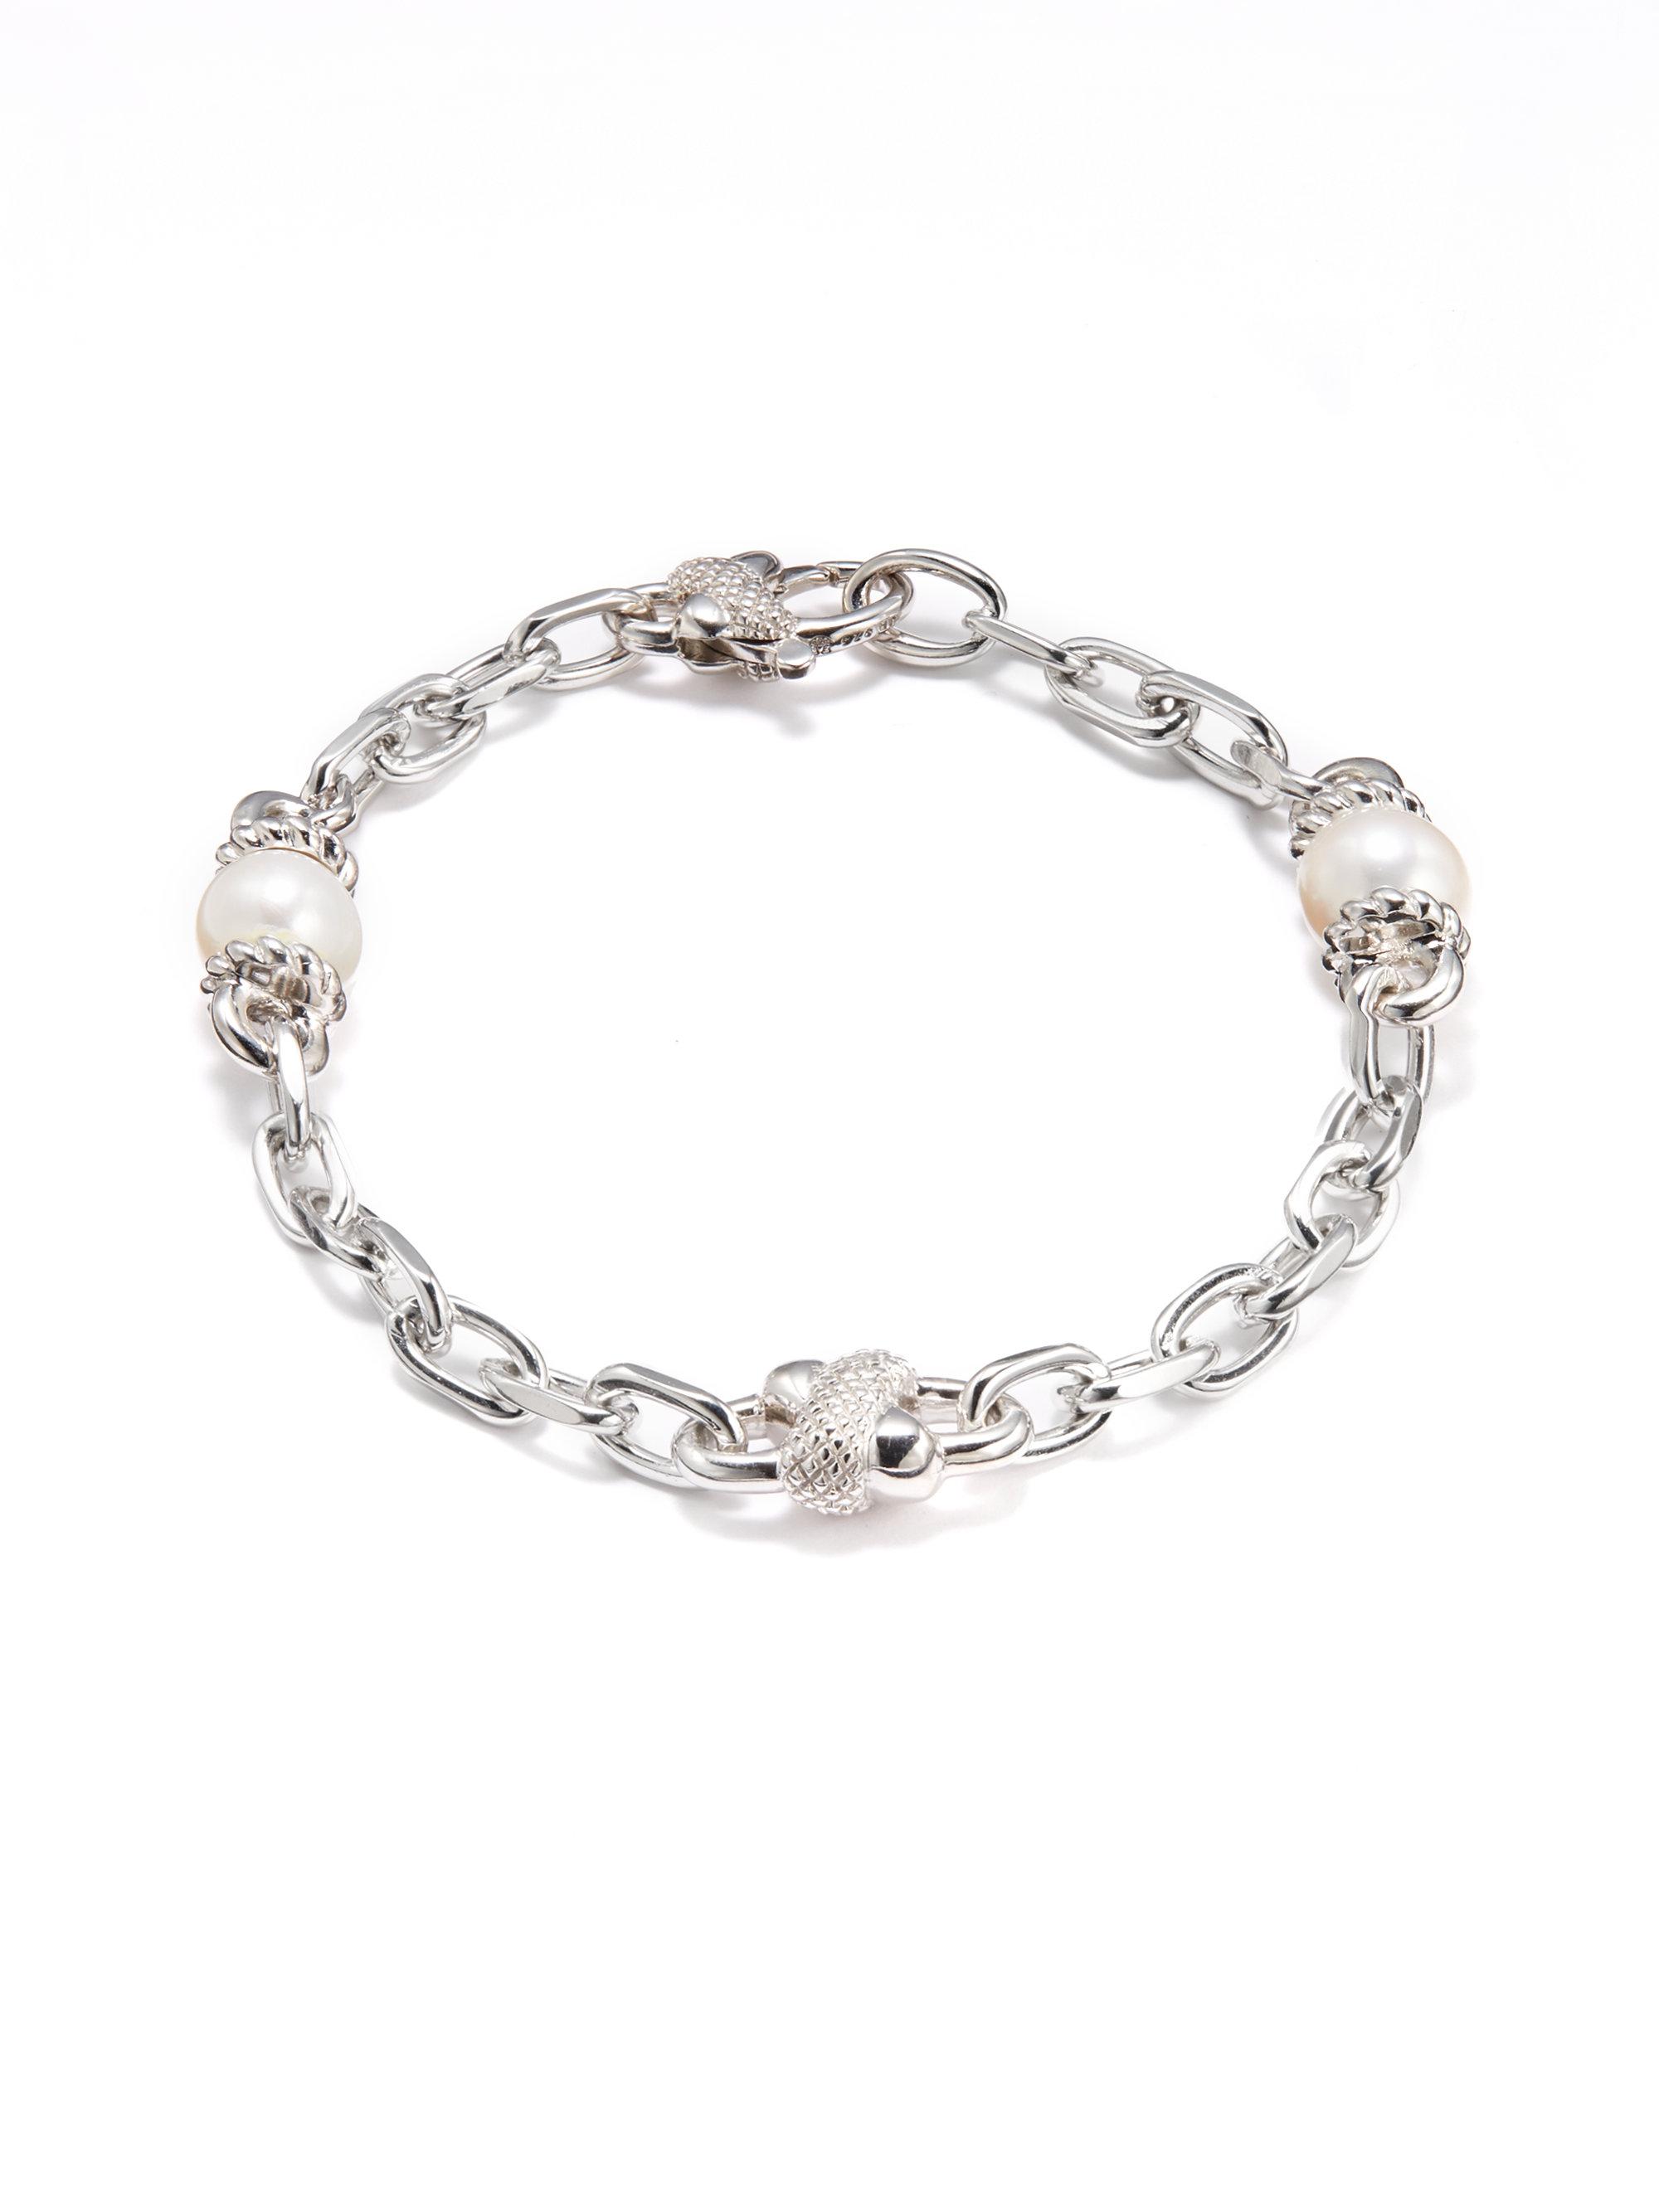 Judith Ripka Freshwater Pearl Sterling Silver Bracelet In